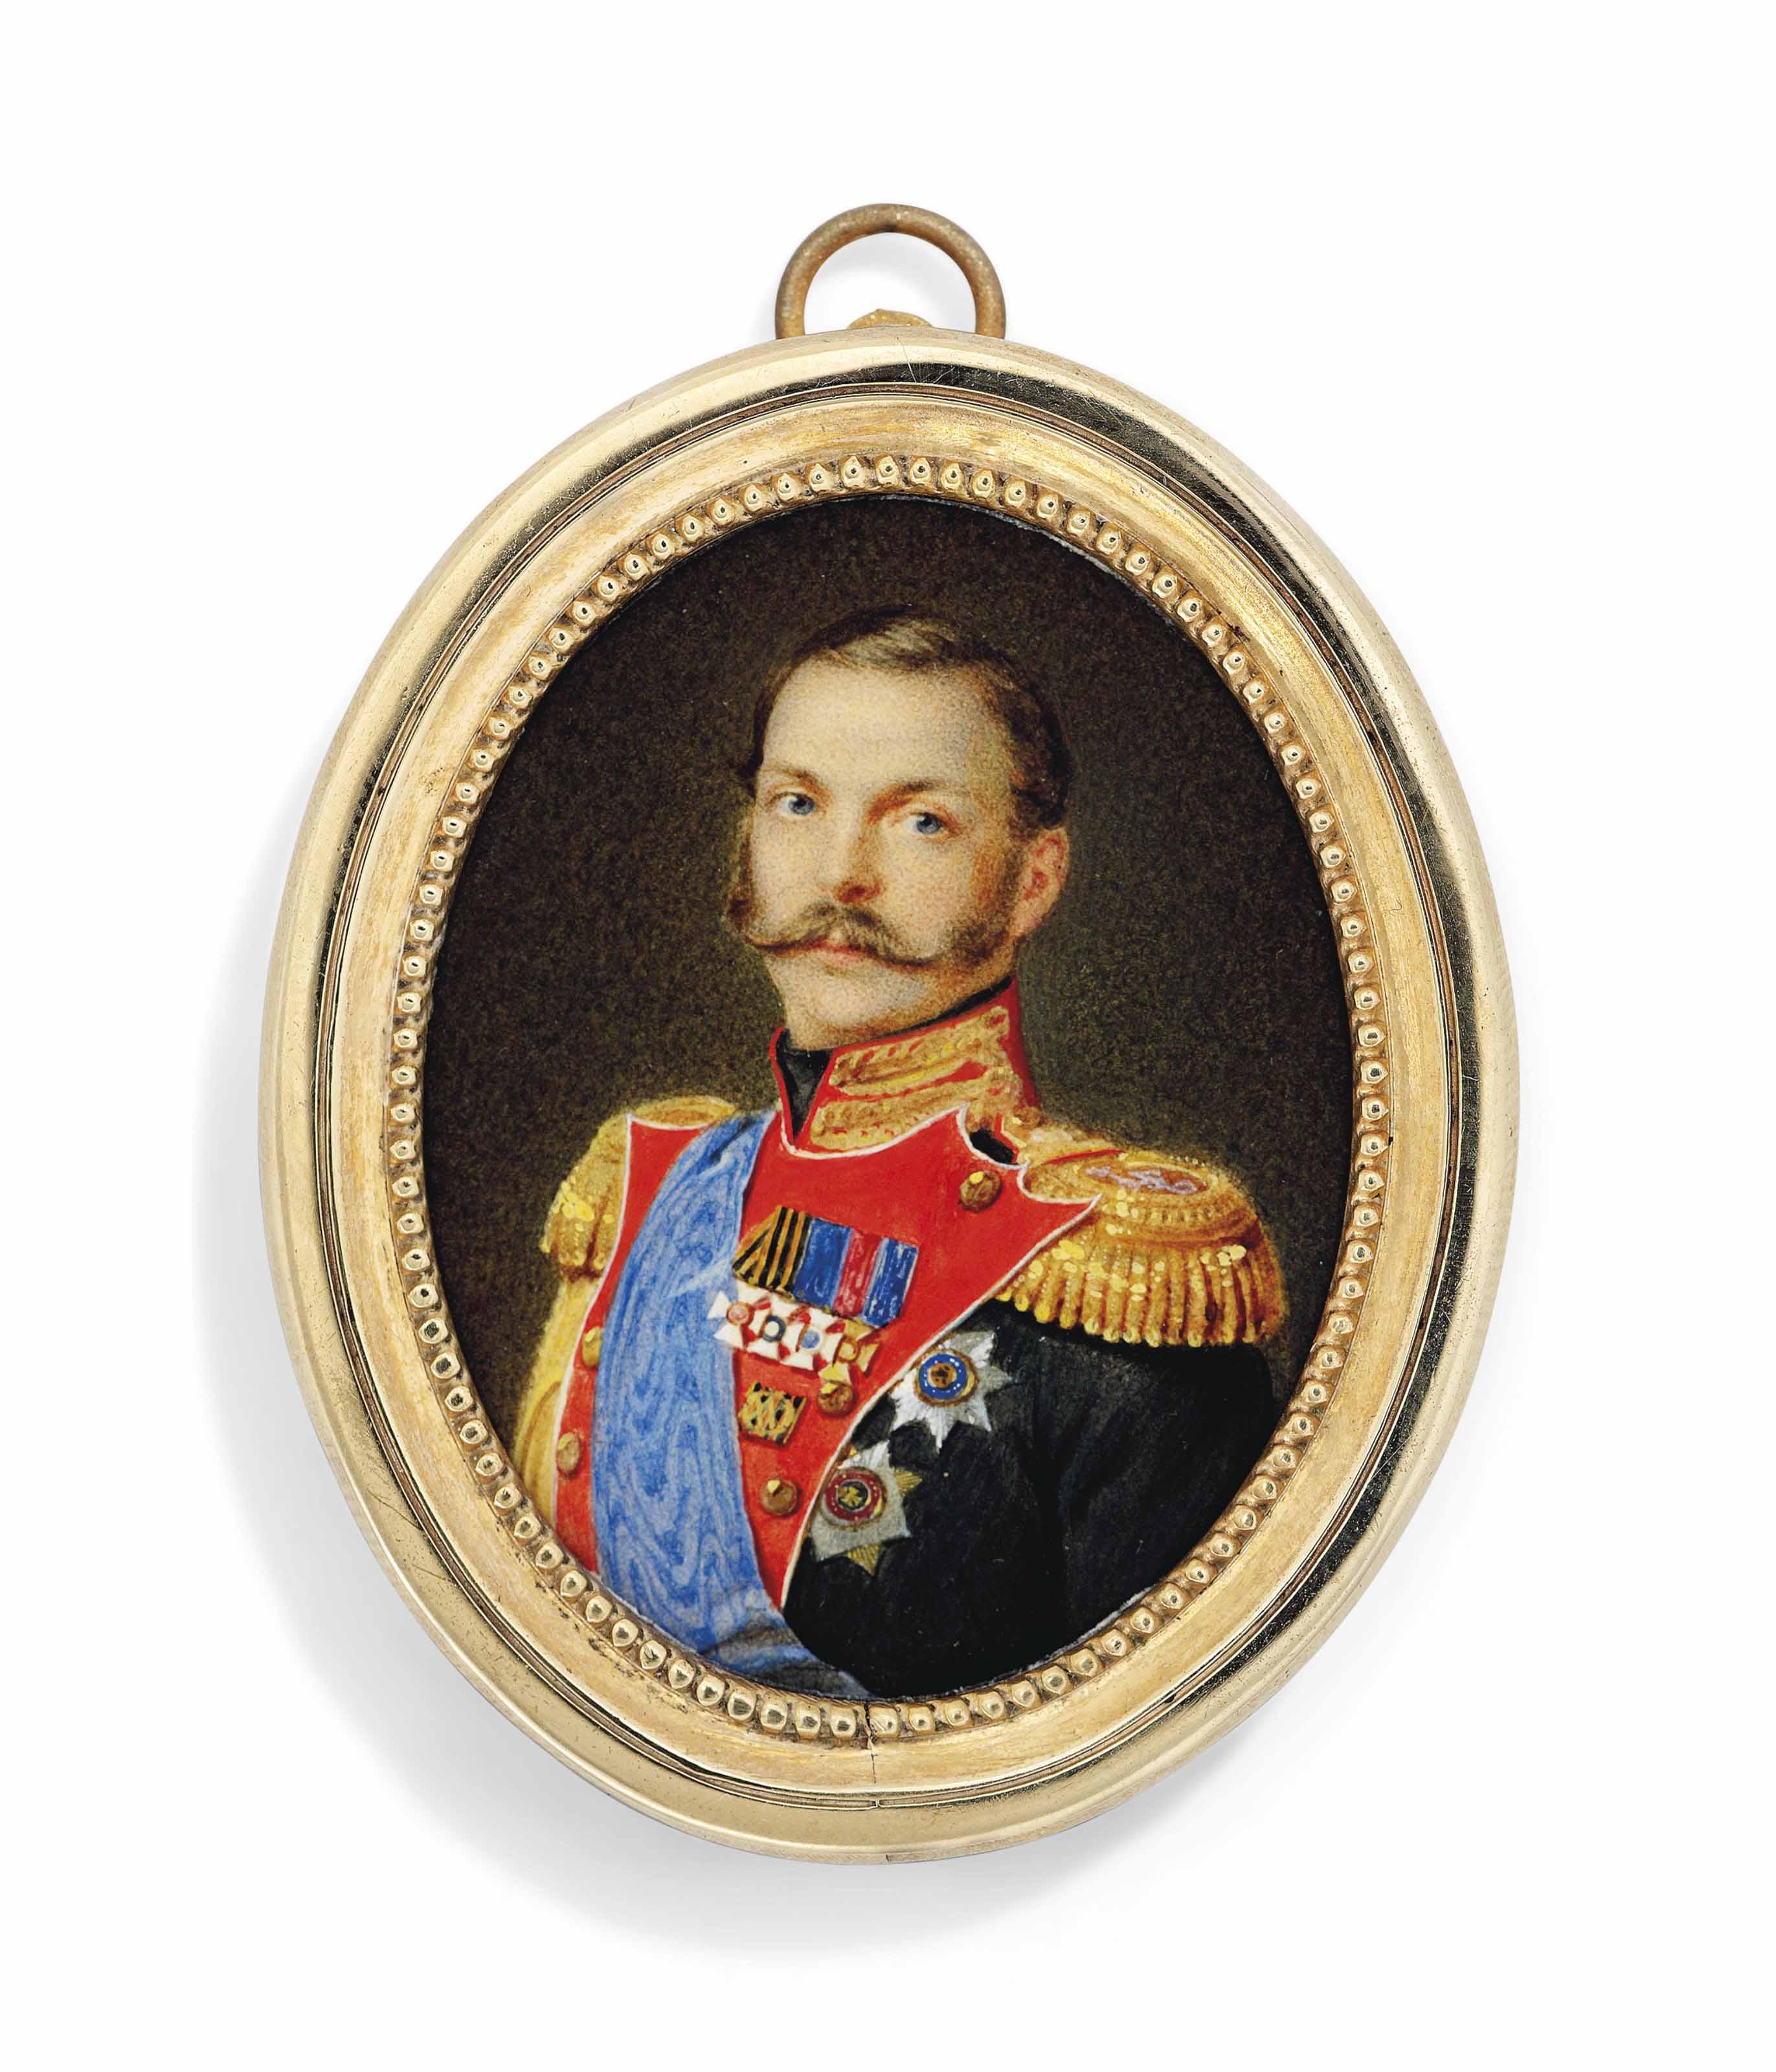 ATTRIBUTED TO ALOIS GUSTAV ROCKSTUHL (RUSSIAN, 1798-1877)